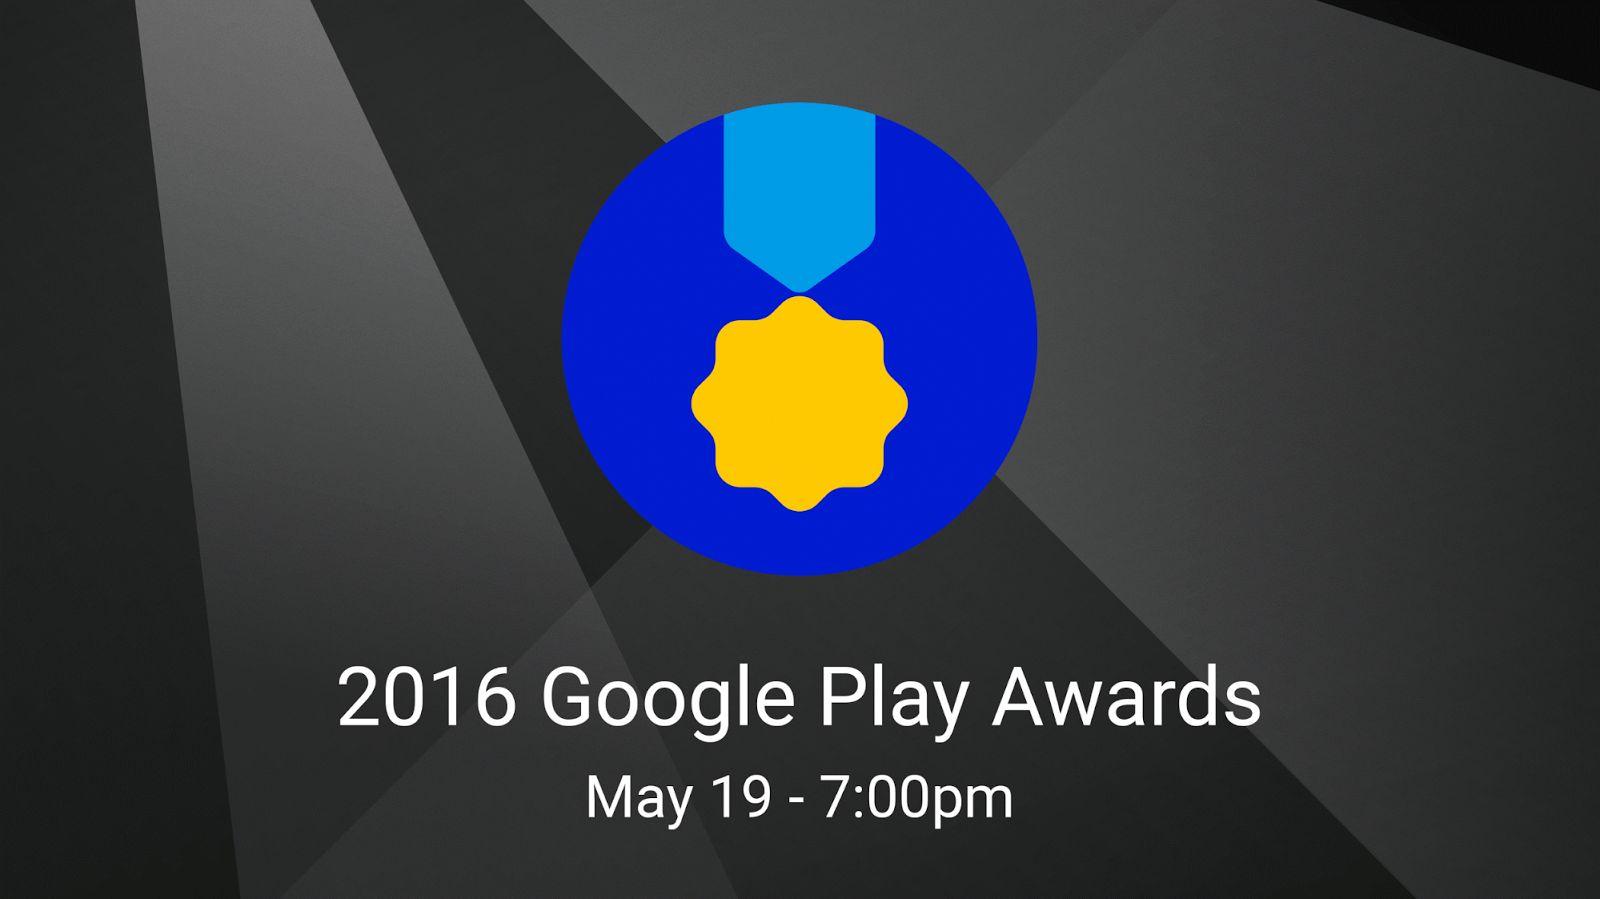 La Google I/O 2016 introduira pour la première fois le prix Google Play